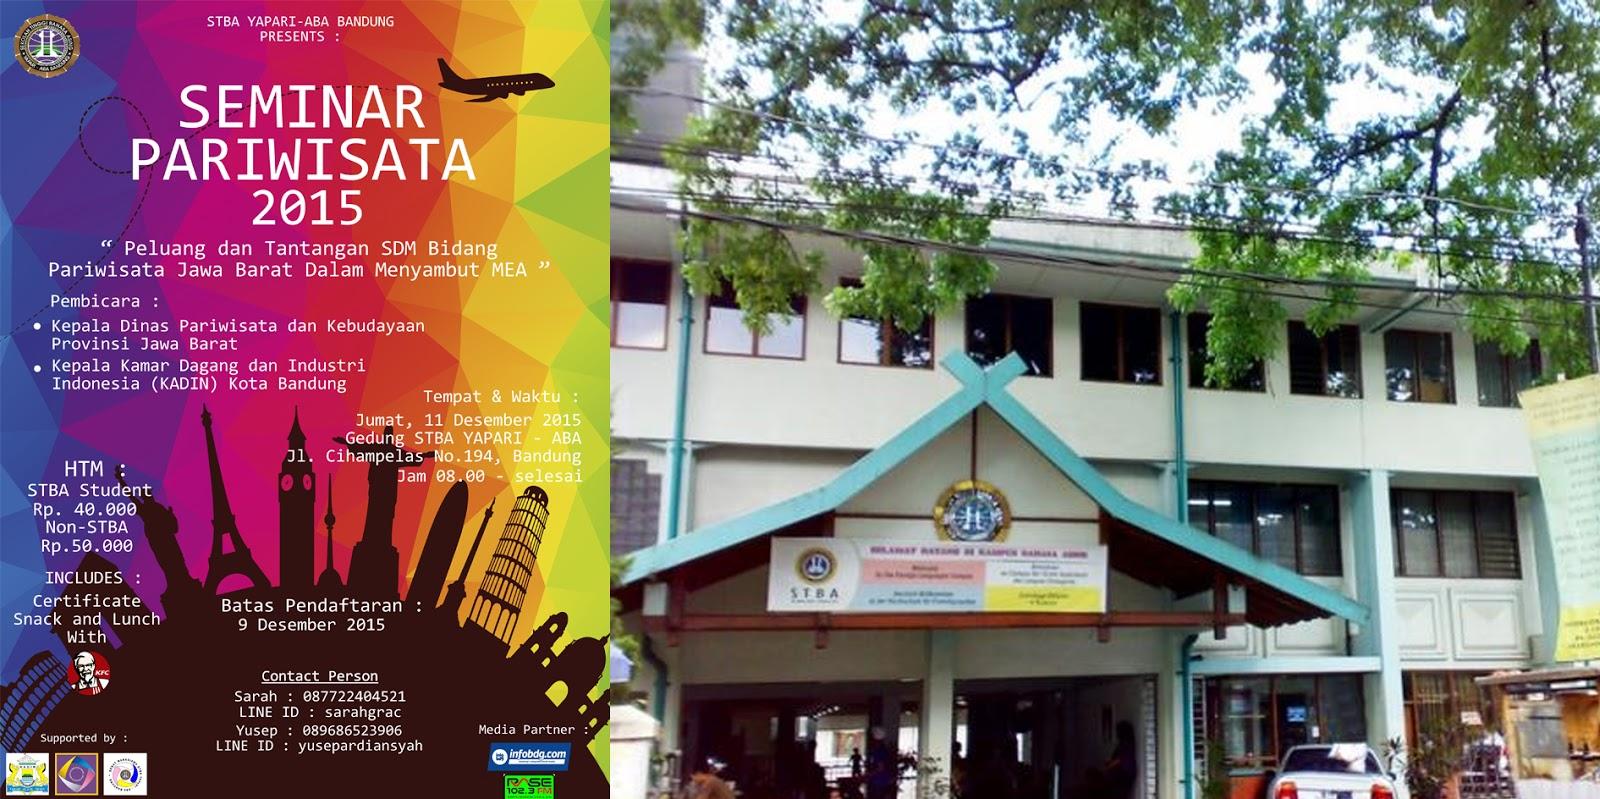 Seminar Pariwisata STBA Yapari ABA Bandung.jpg